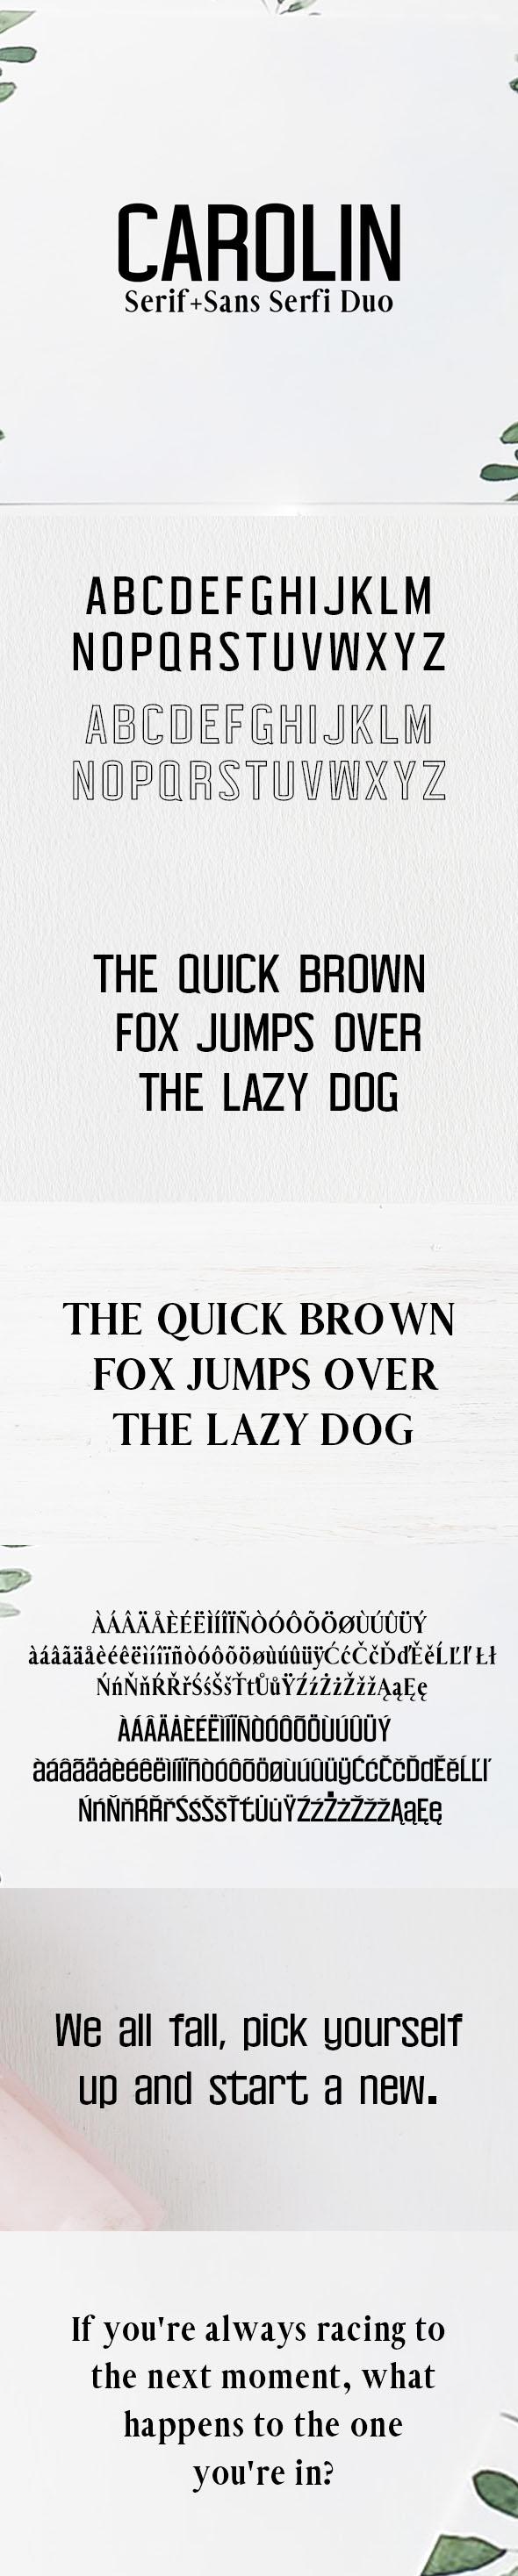 Carolin Duo 5 Font Family Pack - Serif Fonts